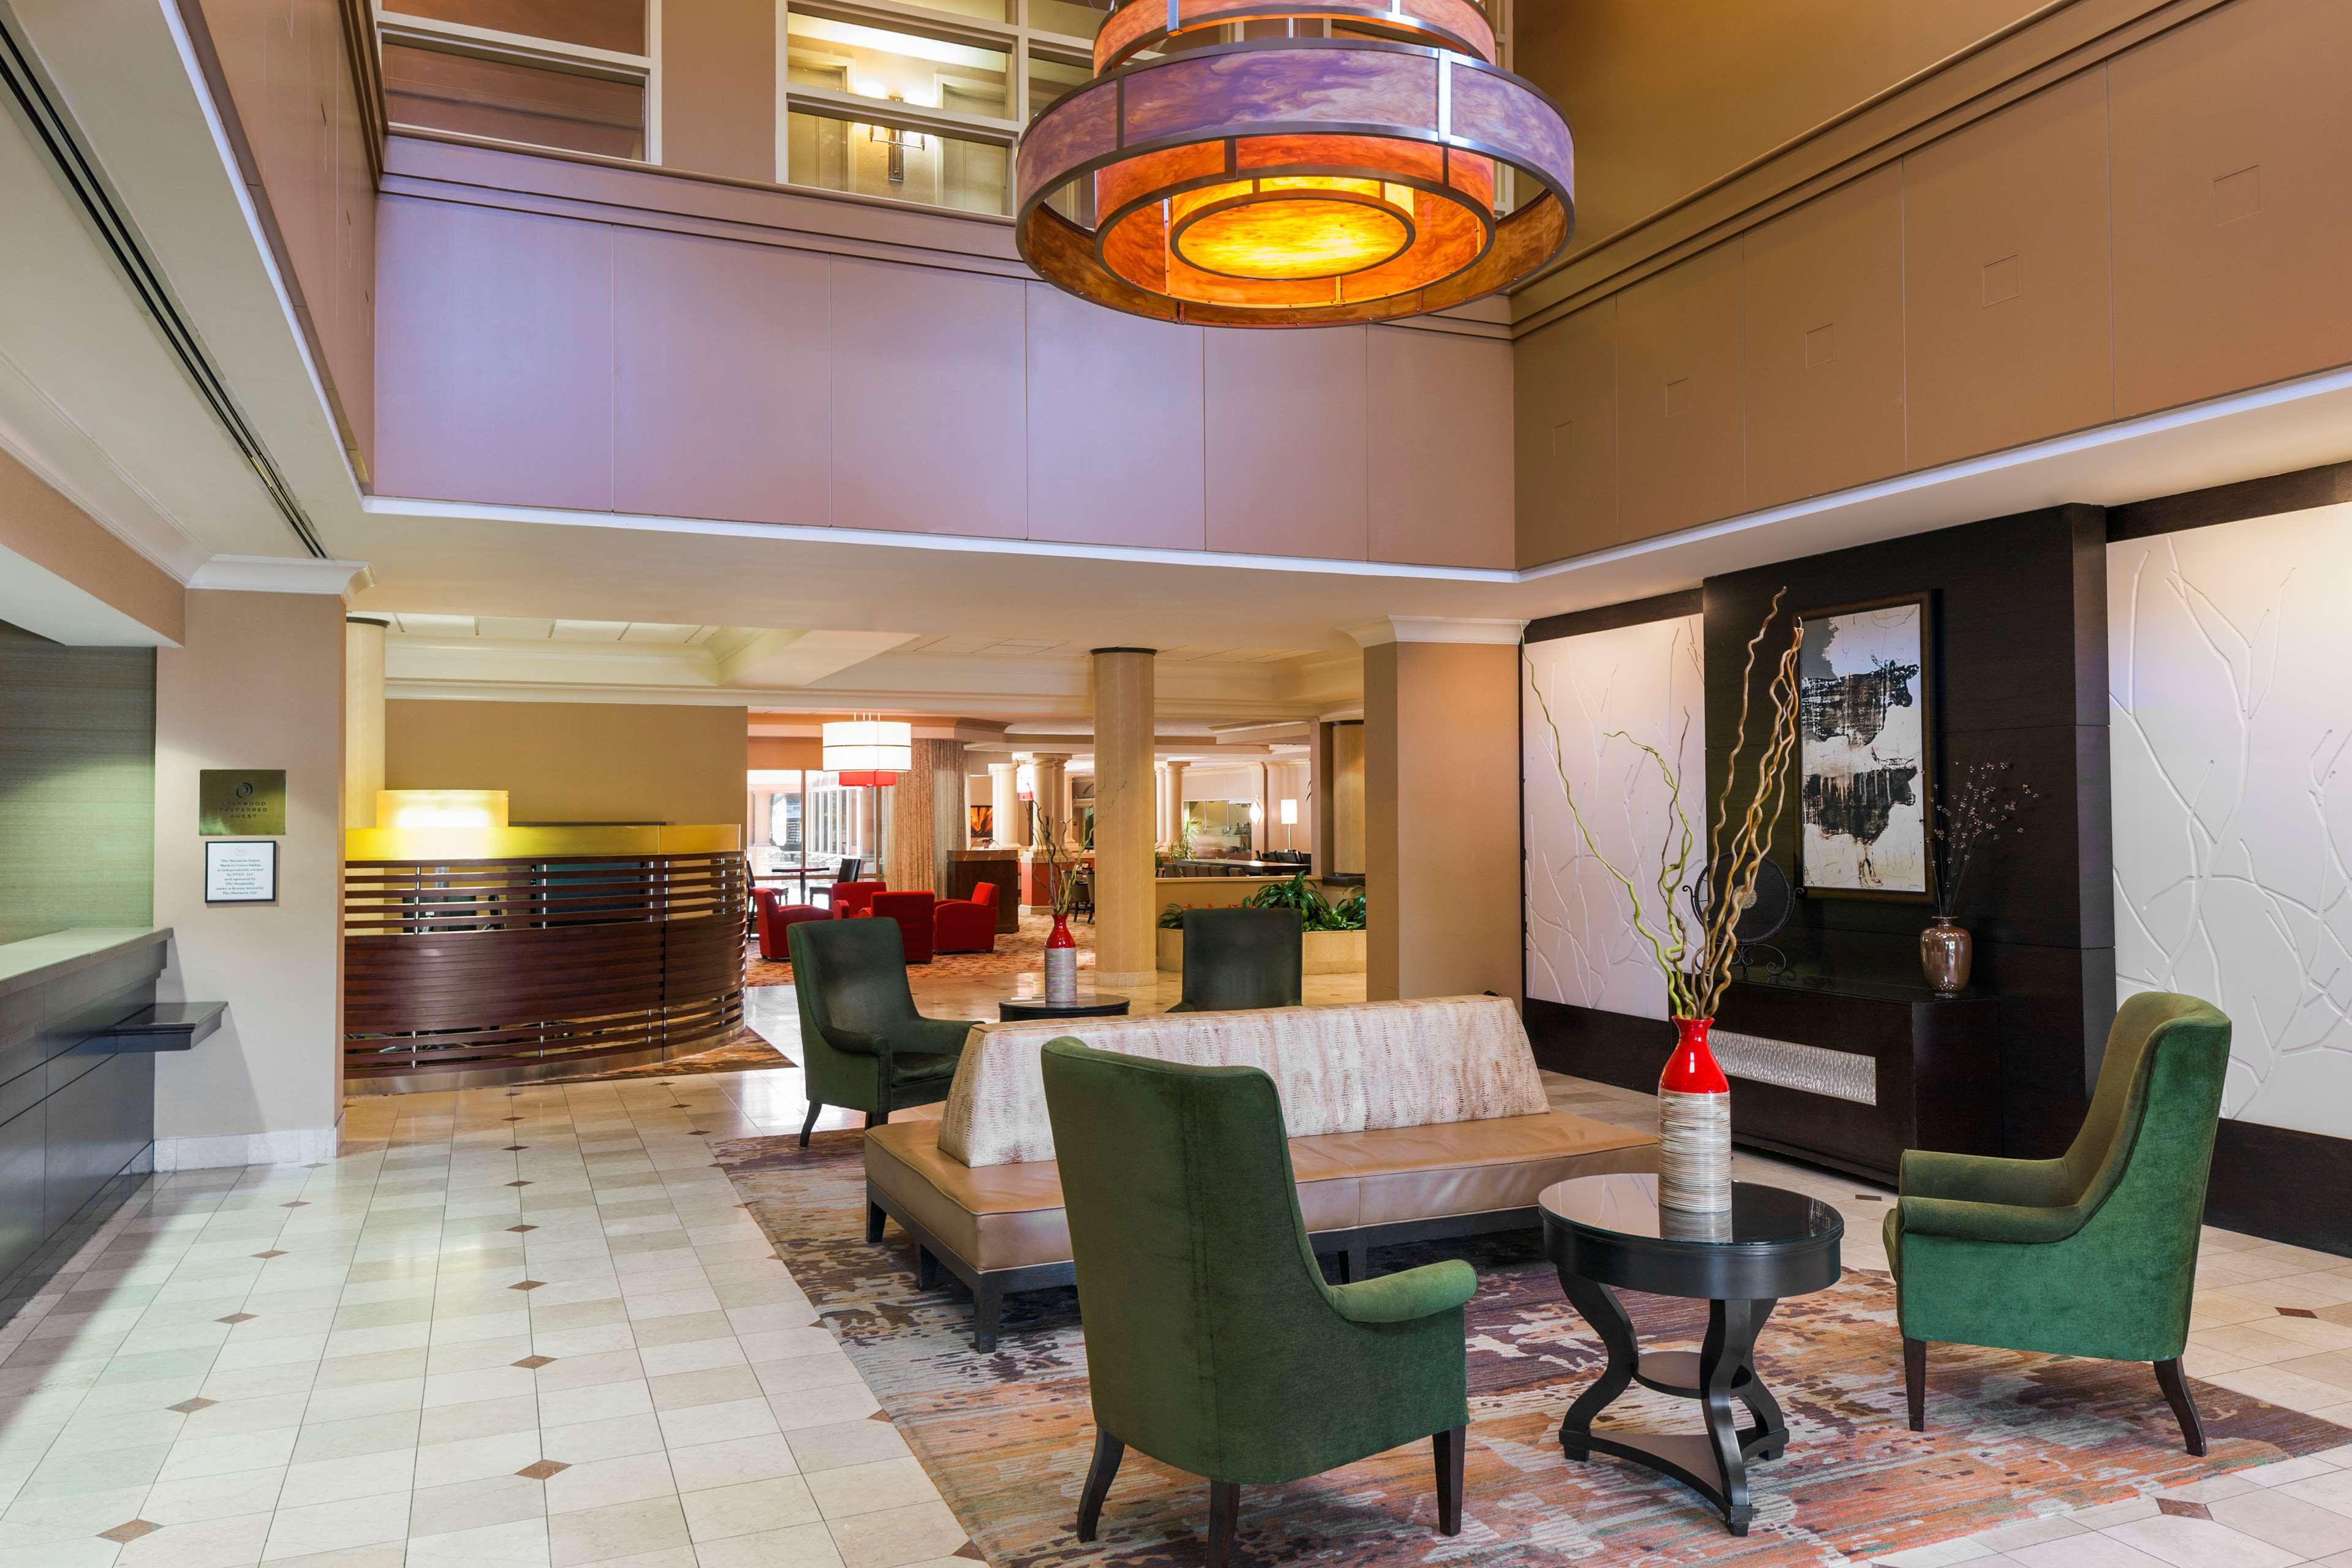 Sheraton Suites Market Center Dallas image 2